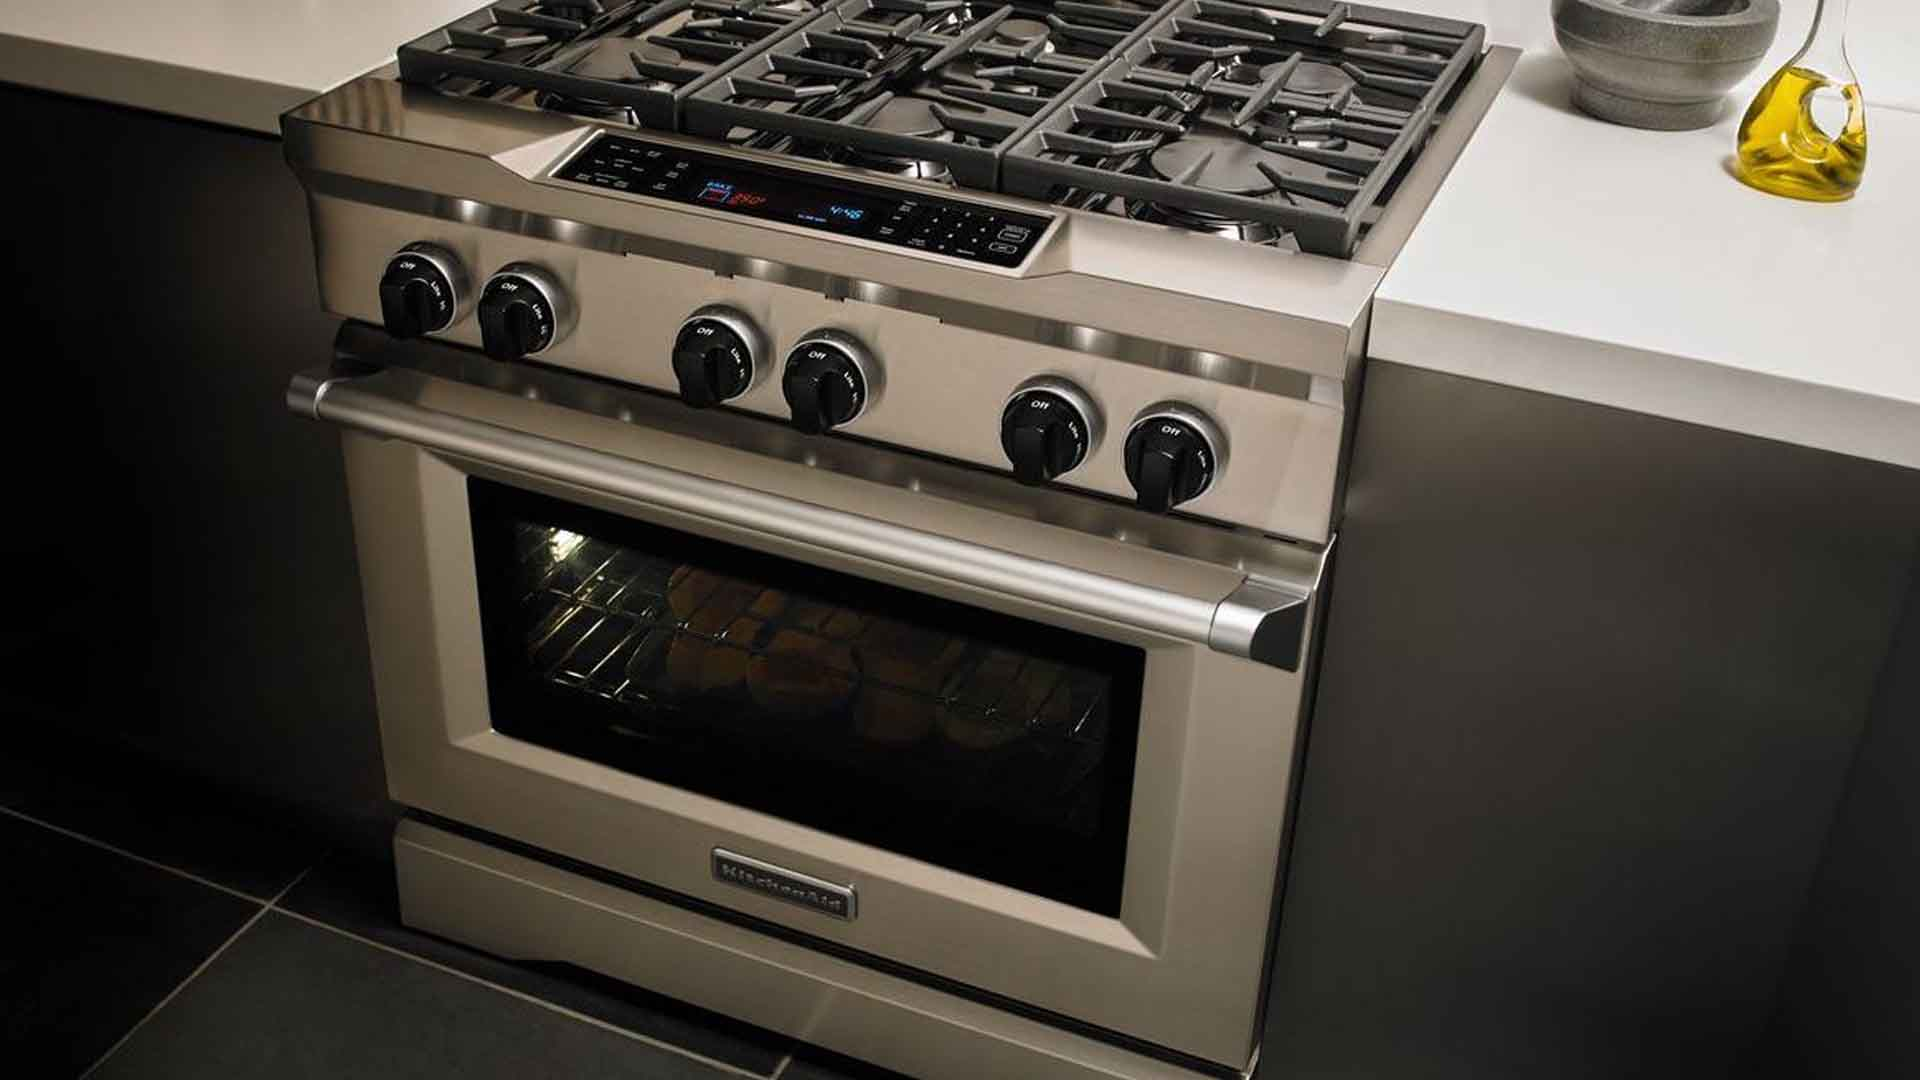 Kitchenaid Commercial Style Dual Fuel Range Repair